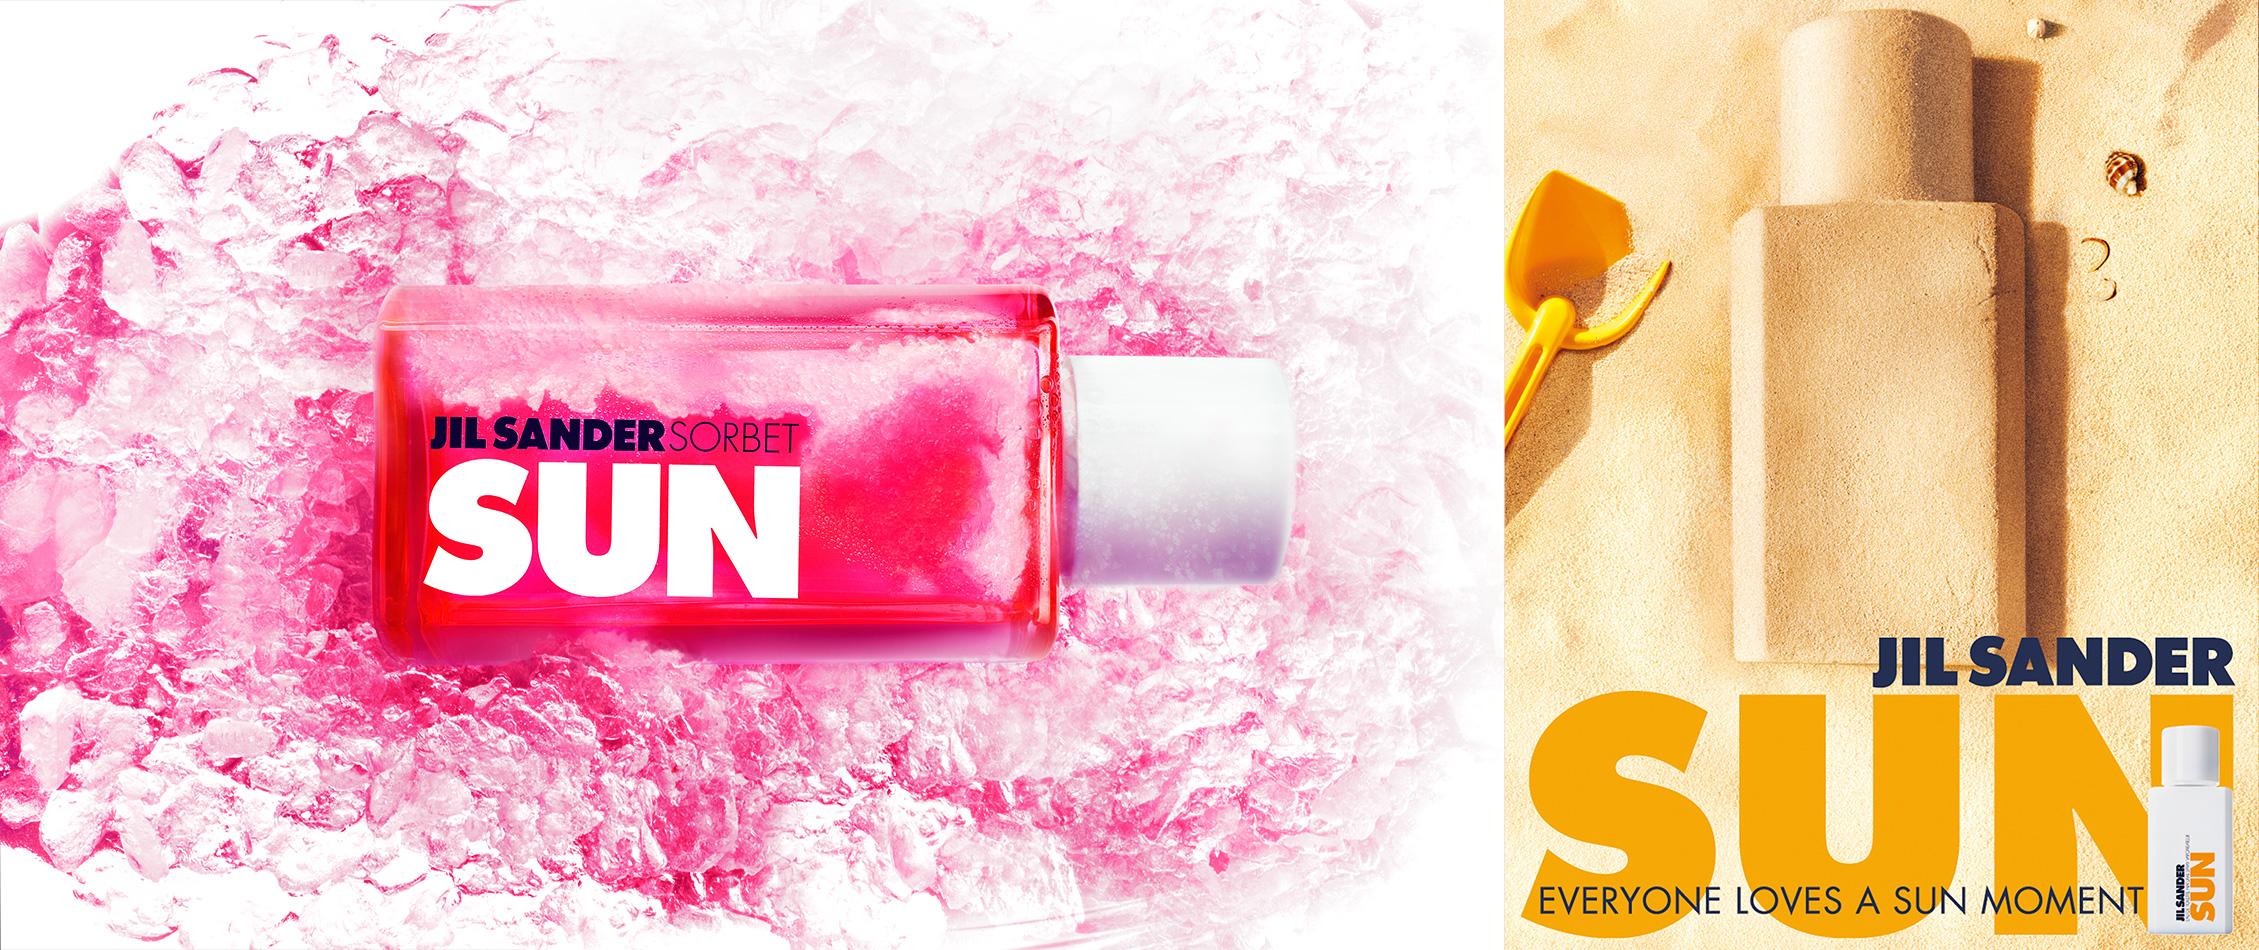 Jil Sander Sun perfume